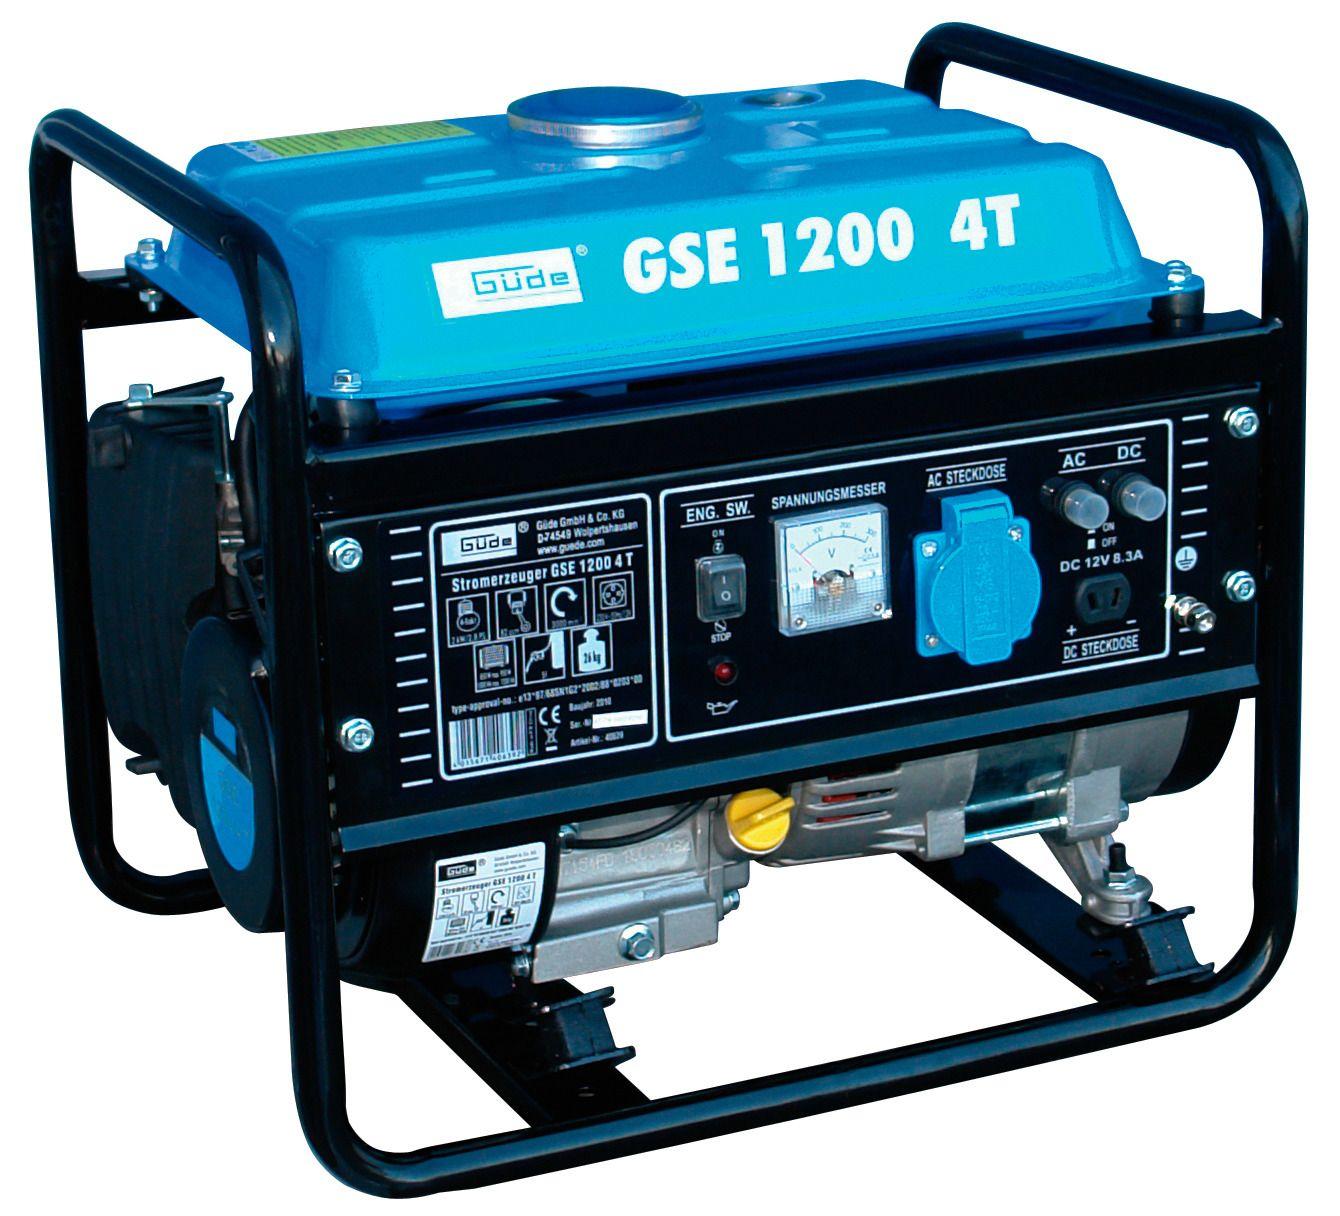 GÜDE Güde Stromerzeuger »GSE 1200 4T«